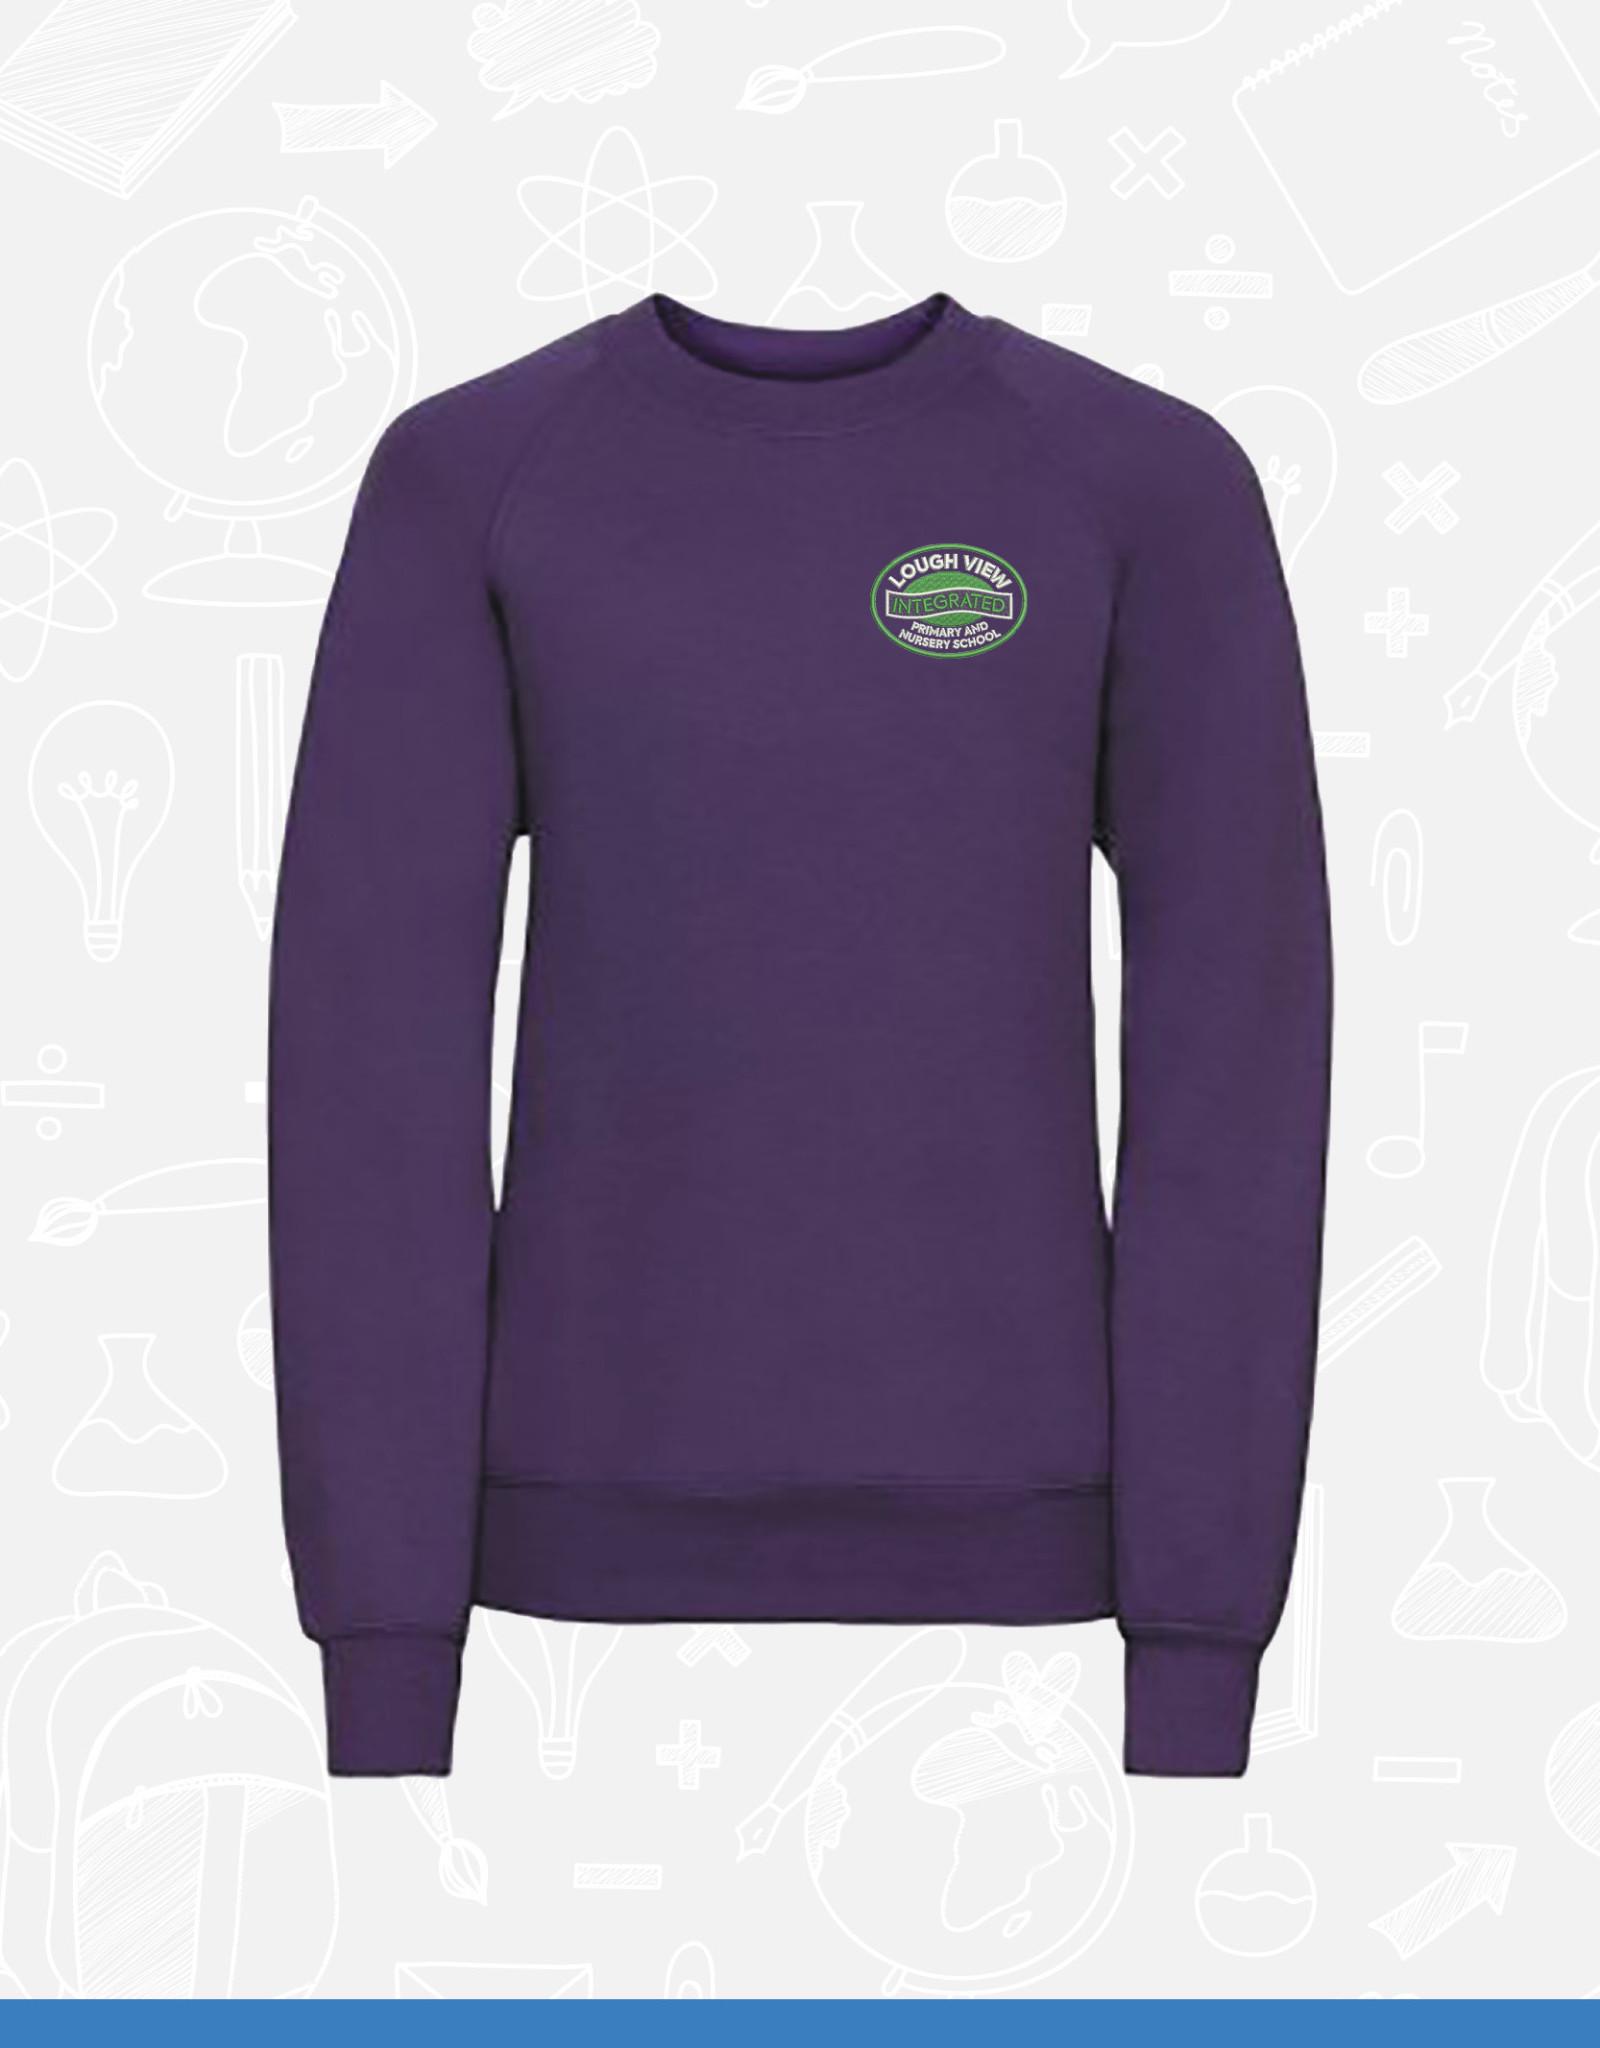 Jerzees Lough View Sweatshirt - Kids (762B)